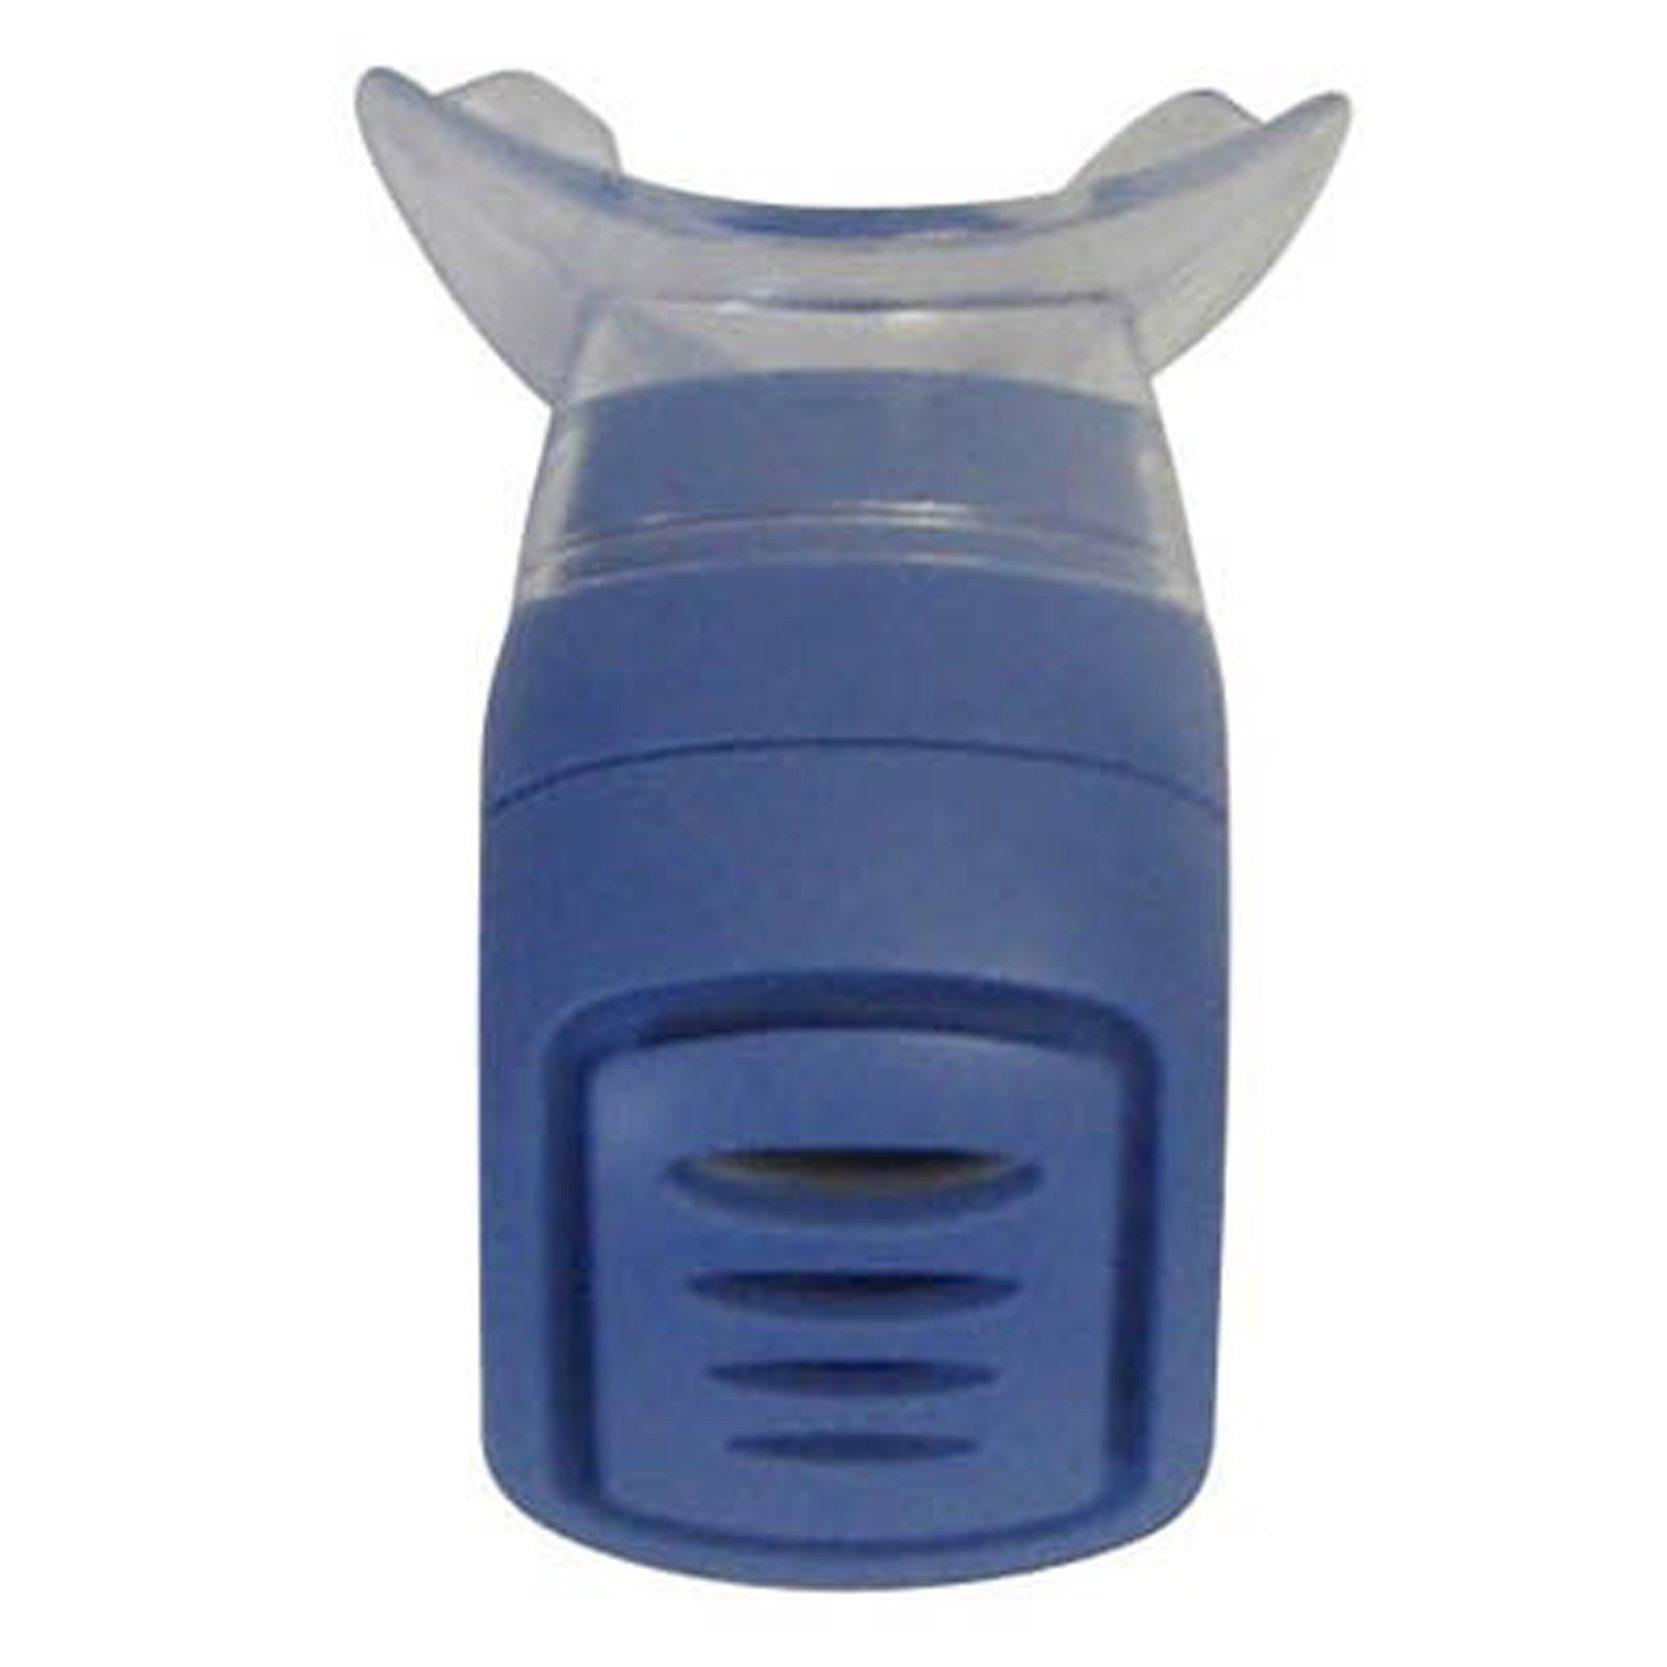 POWERbreathe K-Series Valve Head & Mouthpiece